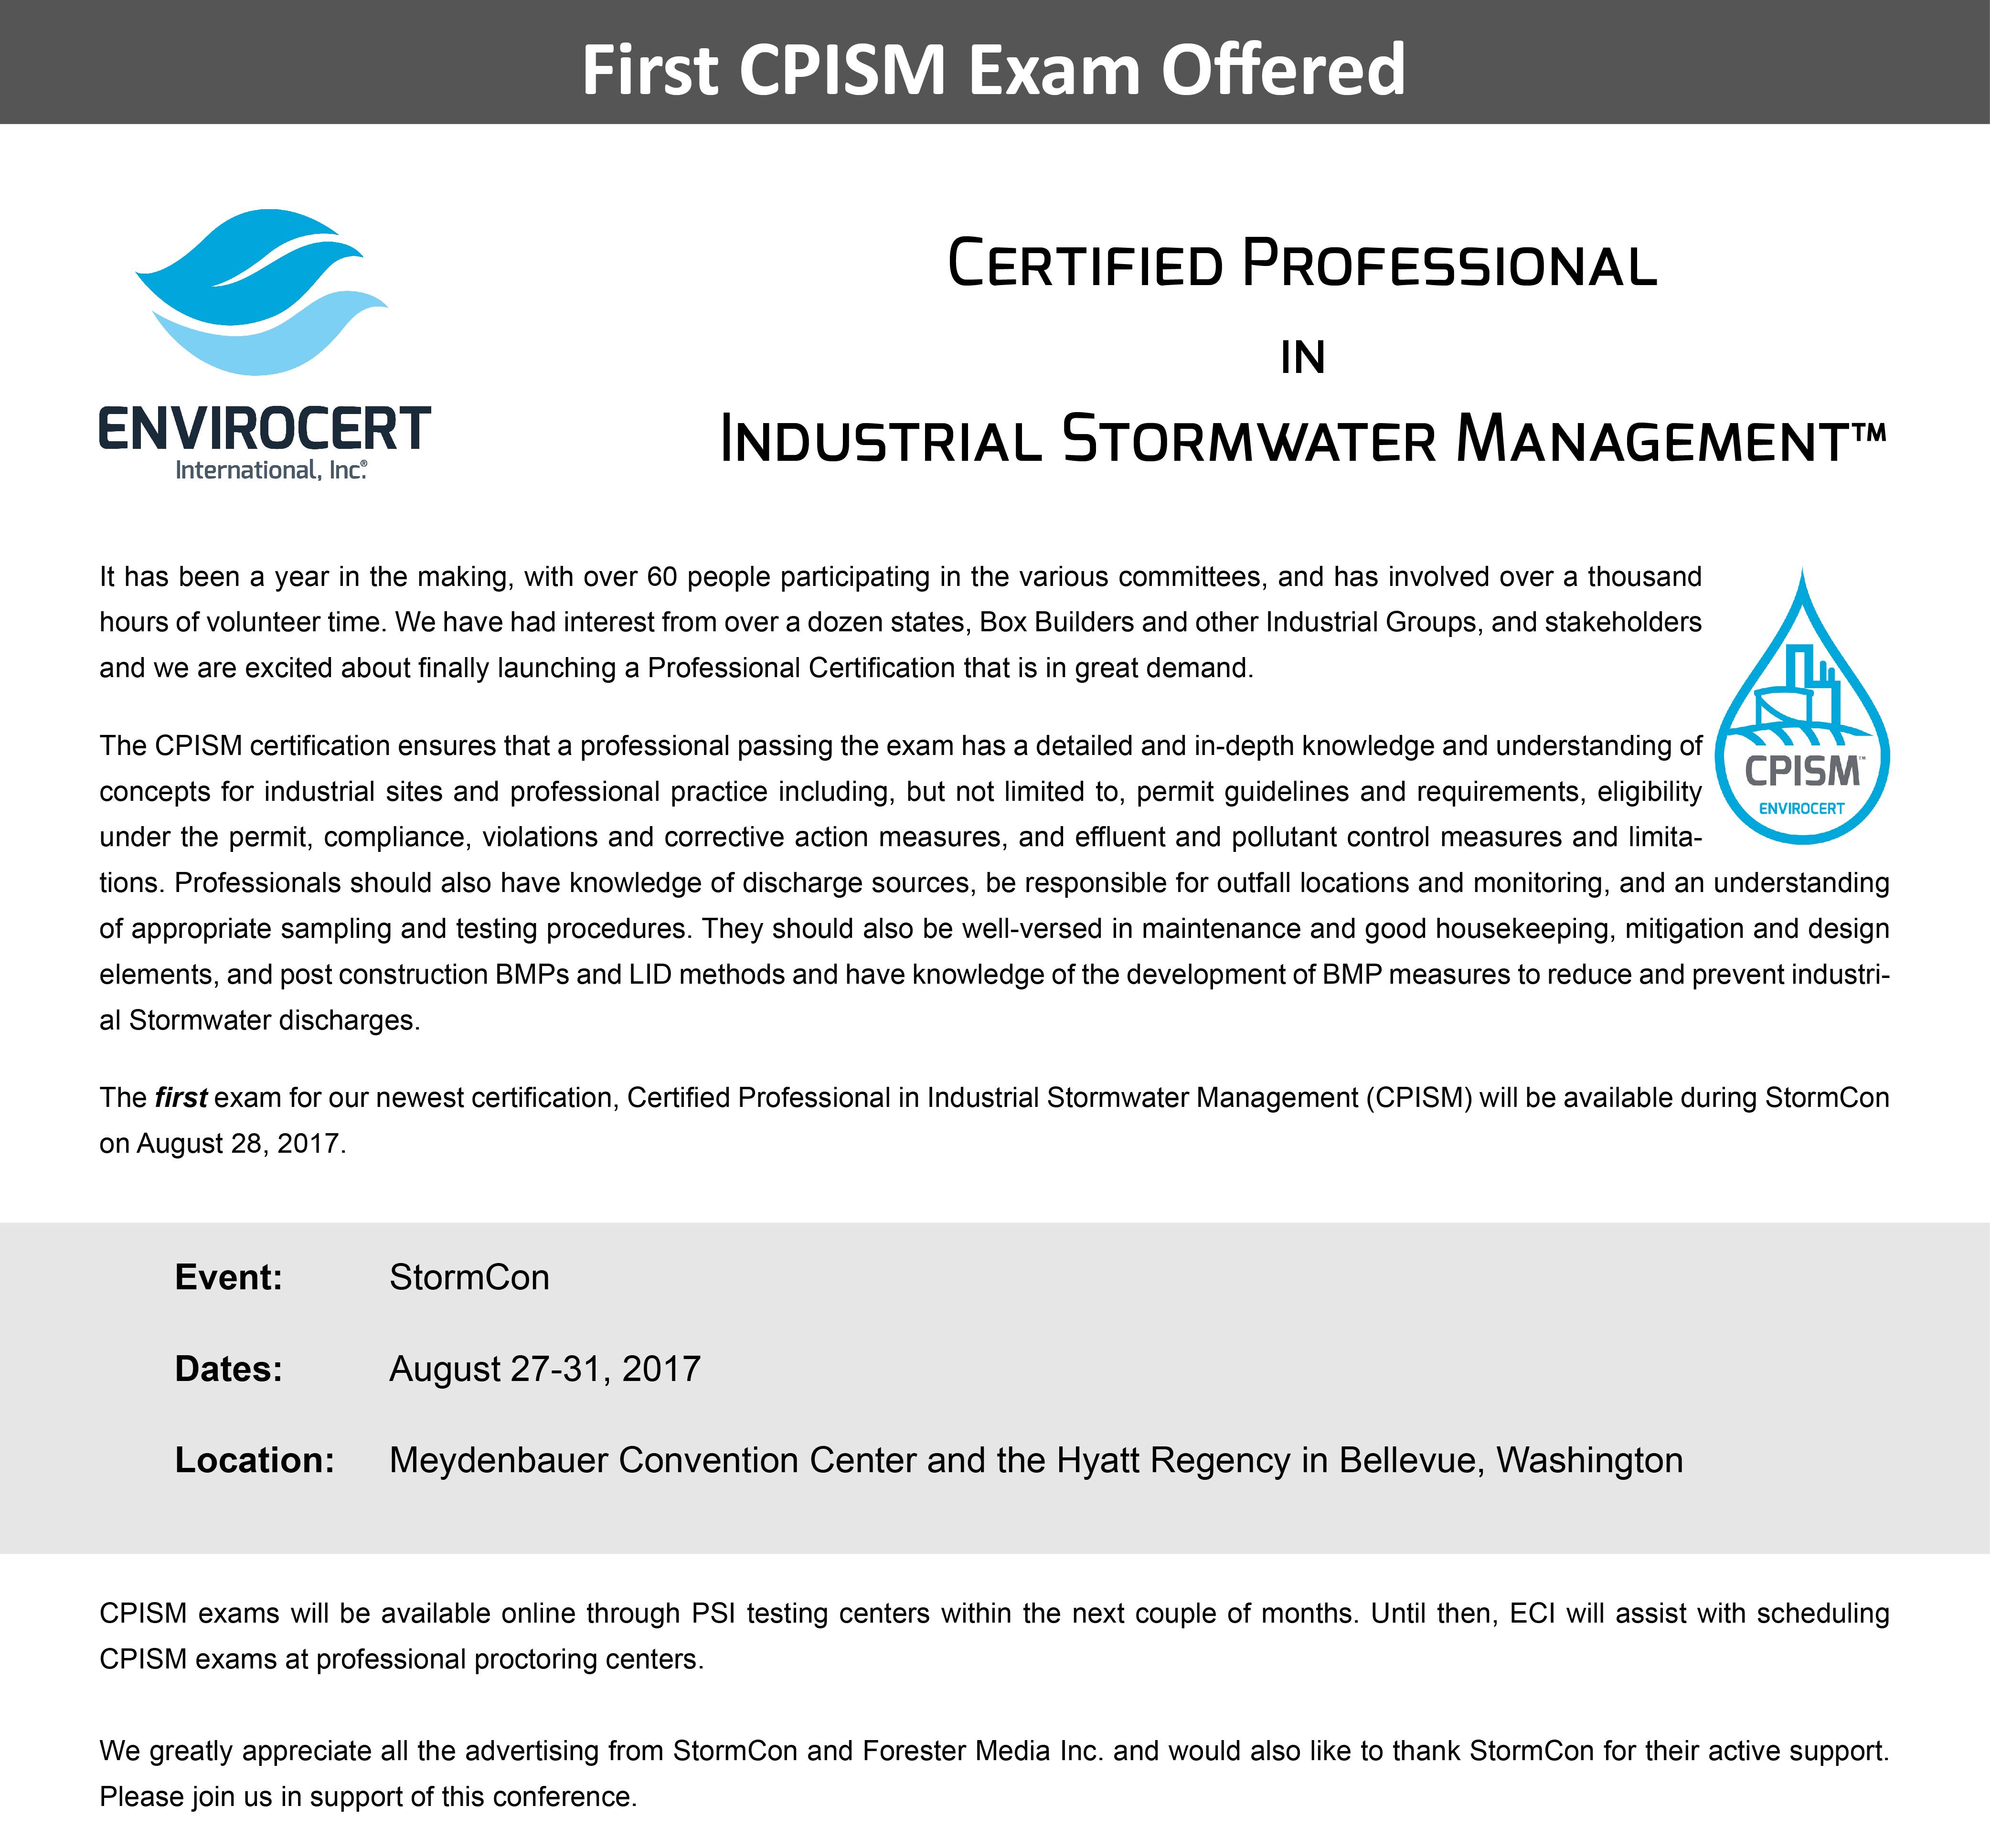 Cpism Exam Offered At Stormcon 2017 Envirocert International Inc